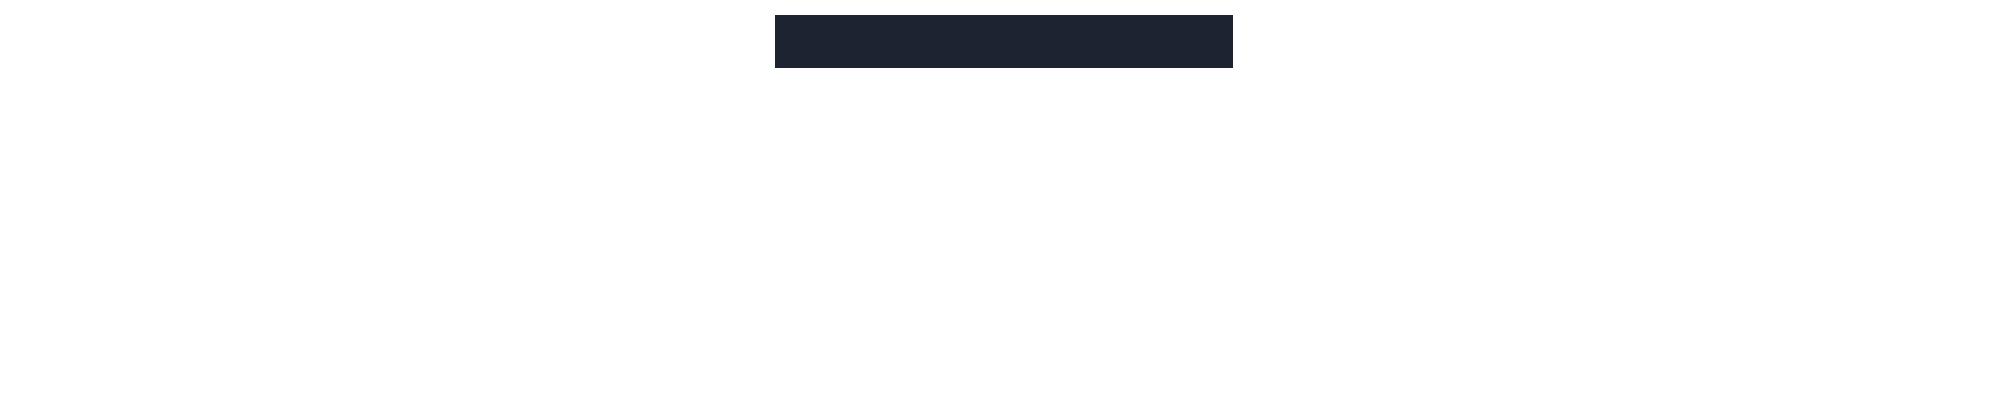 11.04.2020